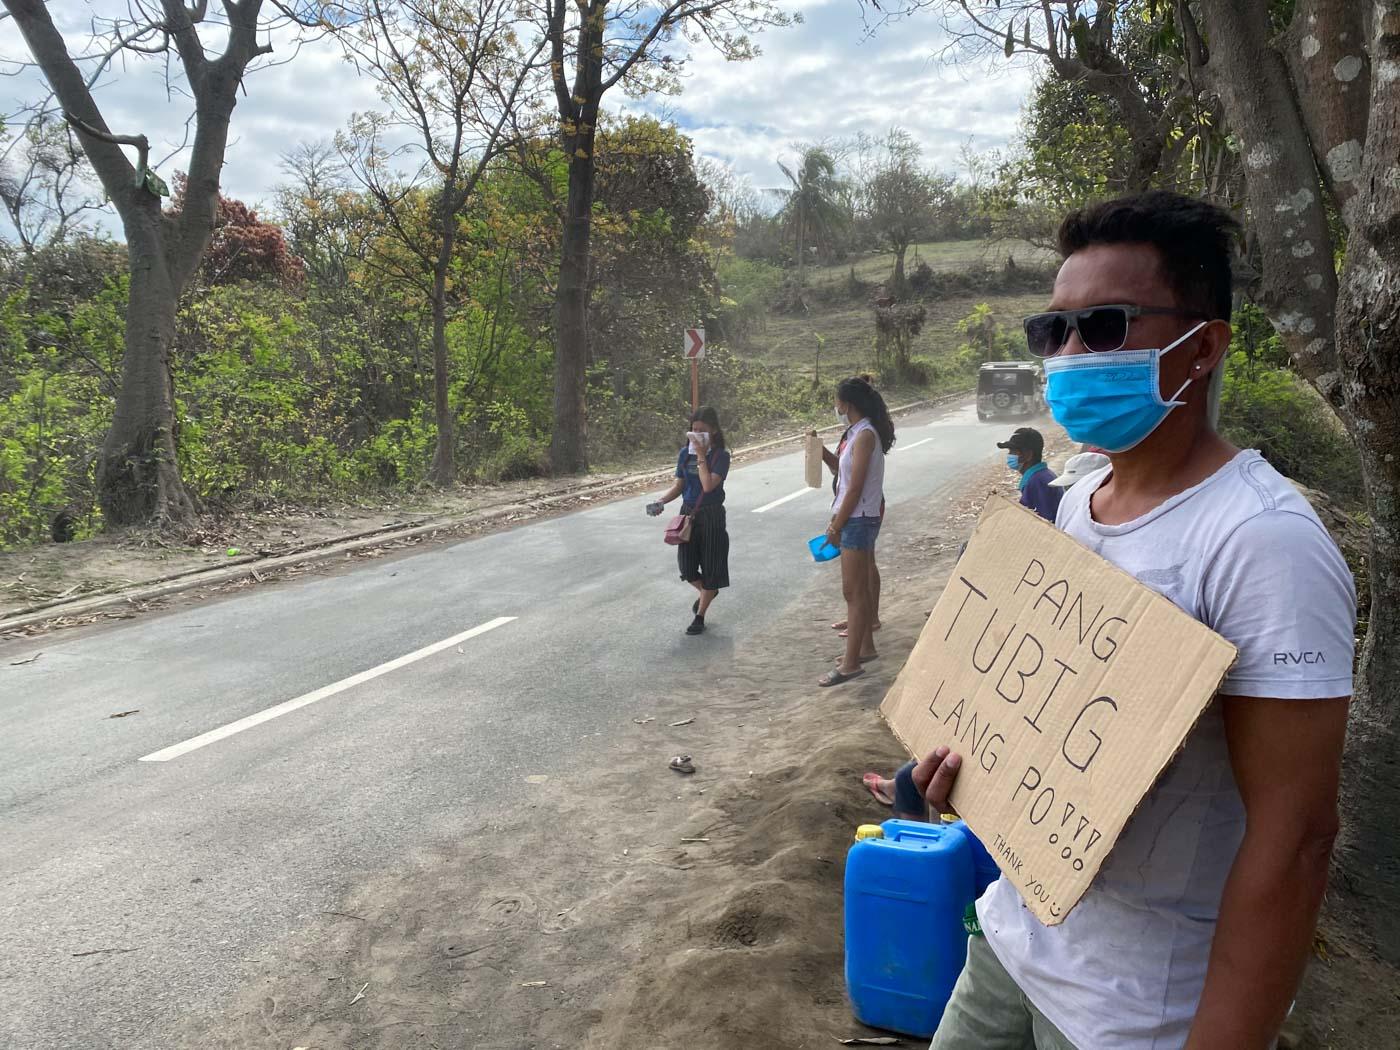 'PANG-TUBIG LANG PO.' Barangay San Guillermo resident Marlon Rosima asks for water from passing vehicles on January 31, 2020. Photo by Mara Cepeda/Rappler